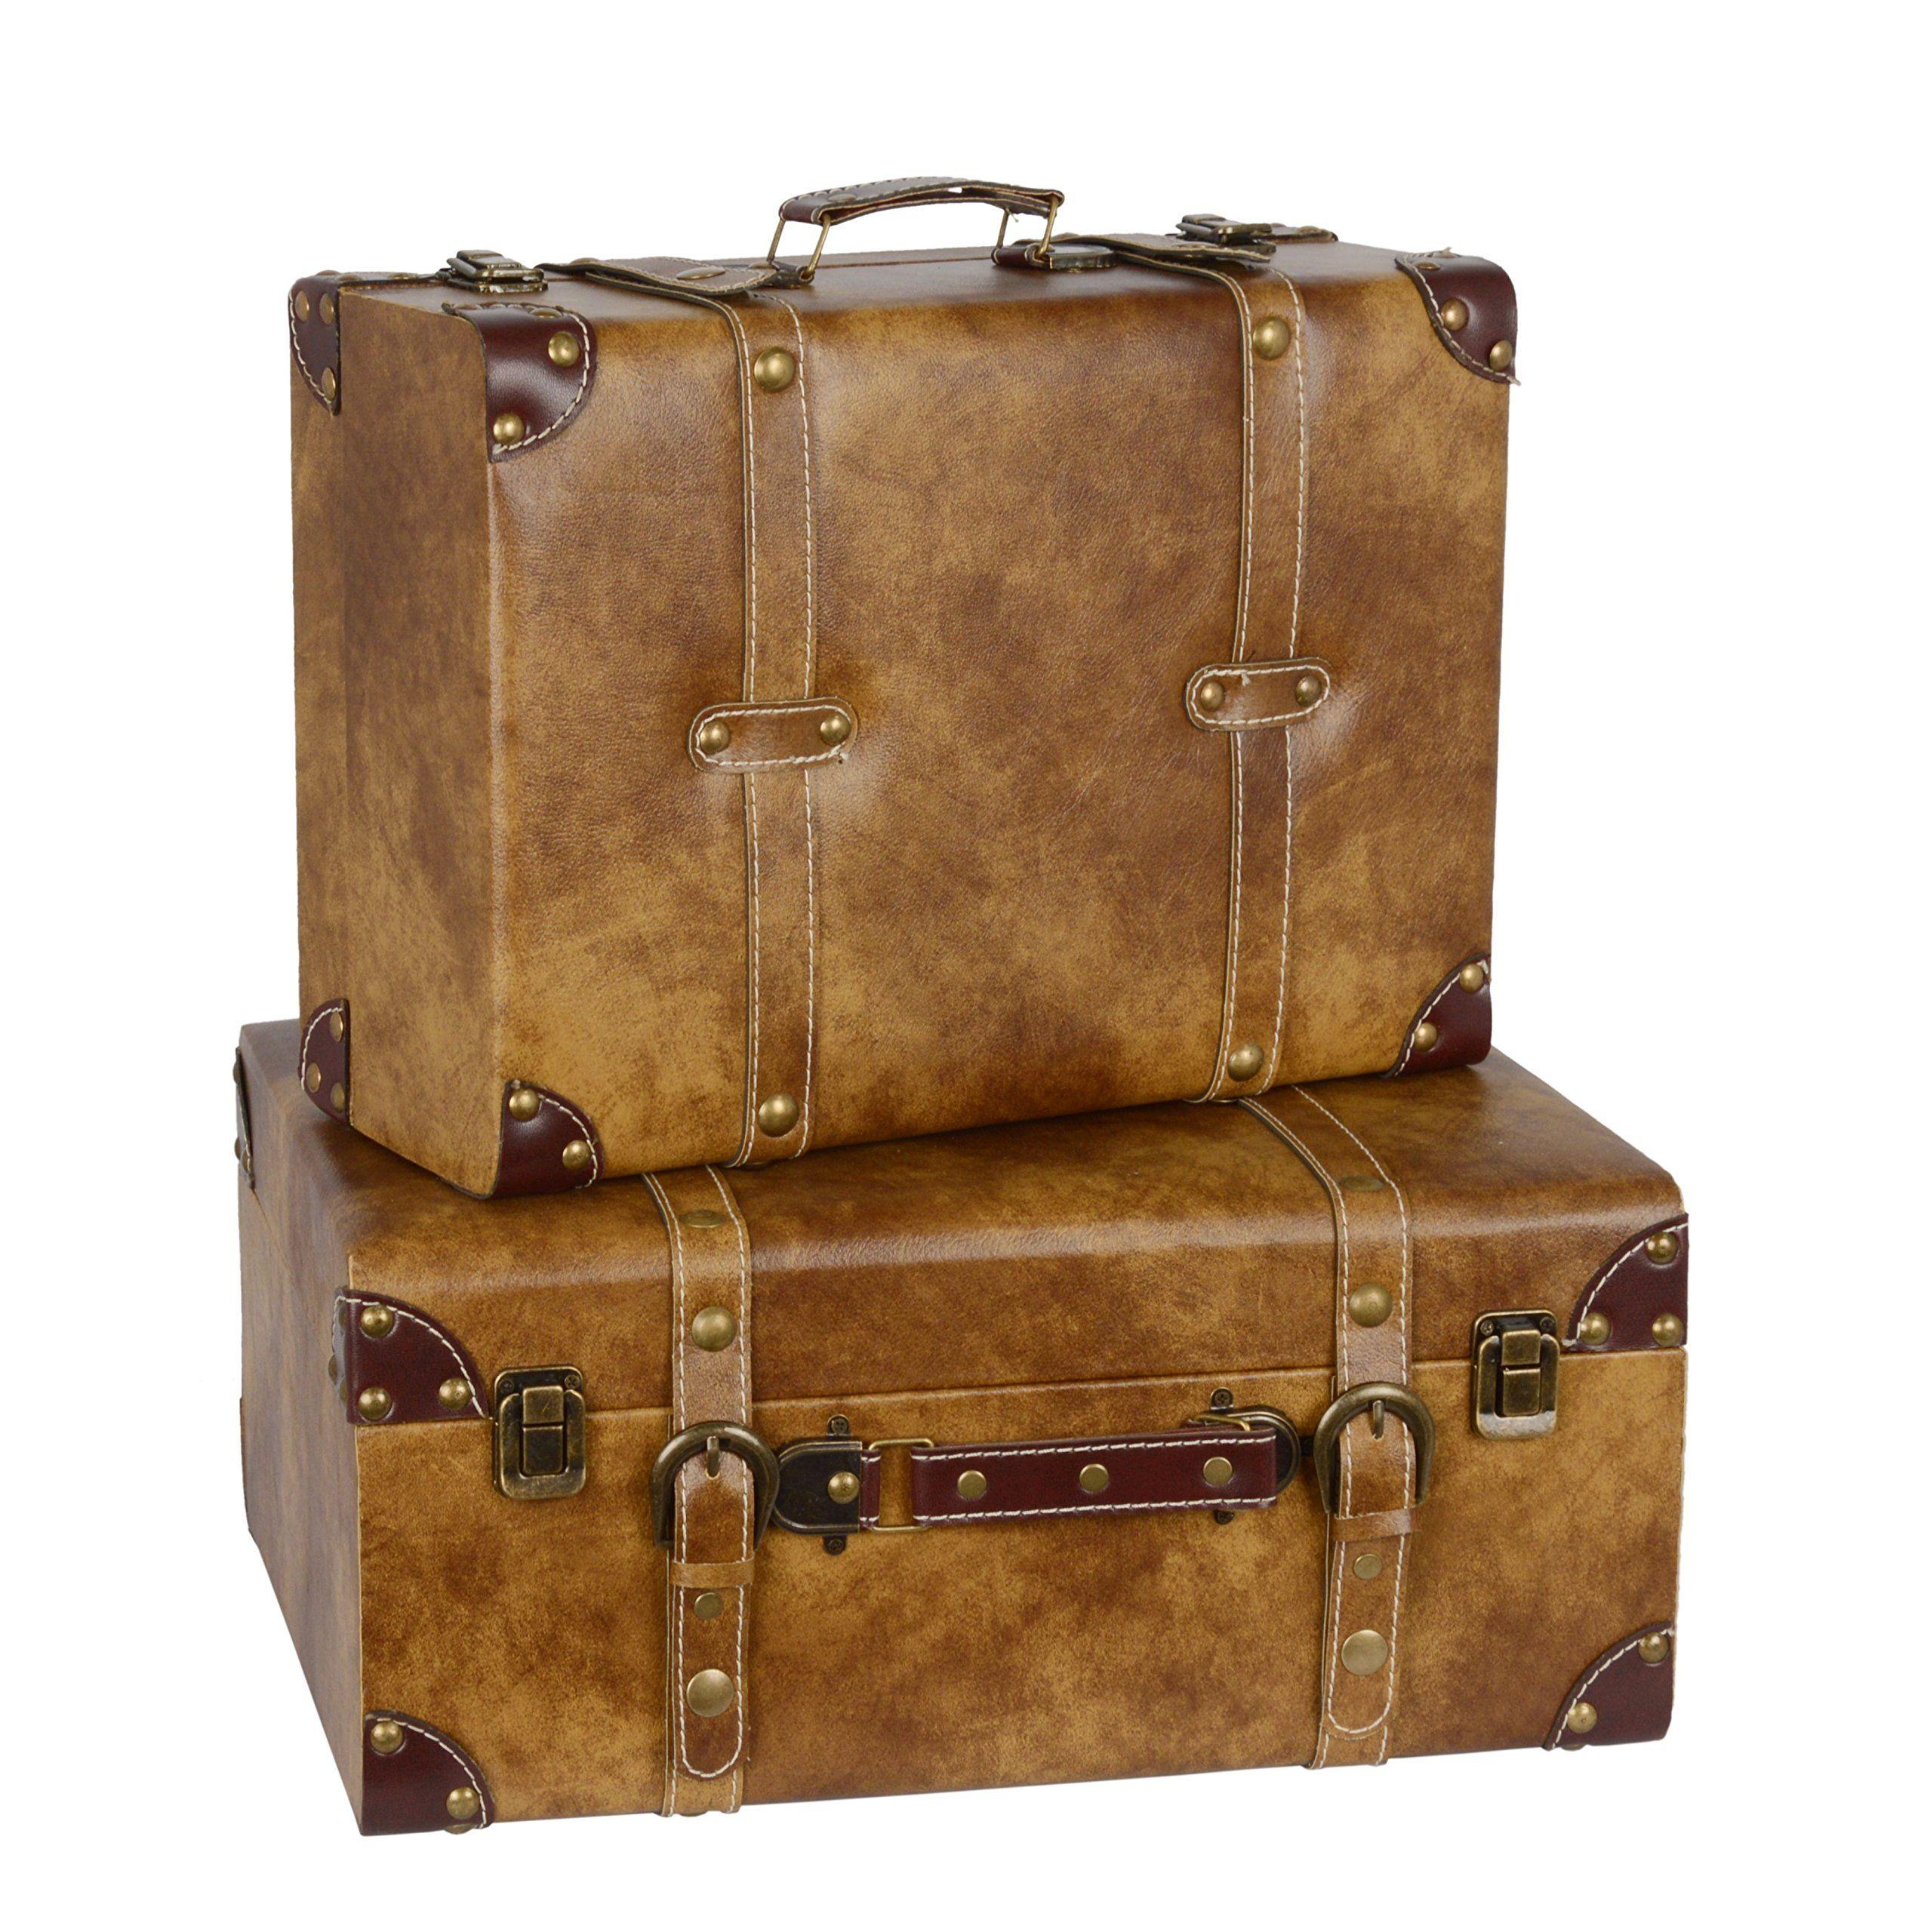 Deko Koffer Box Vintage Retro Aufbewahrung Leder 2er Set L